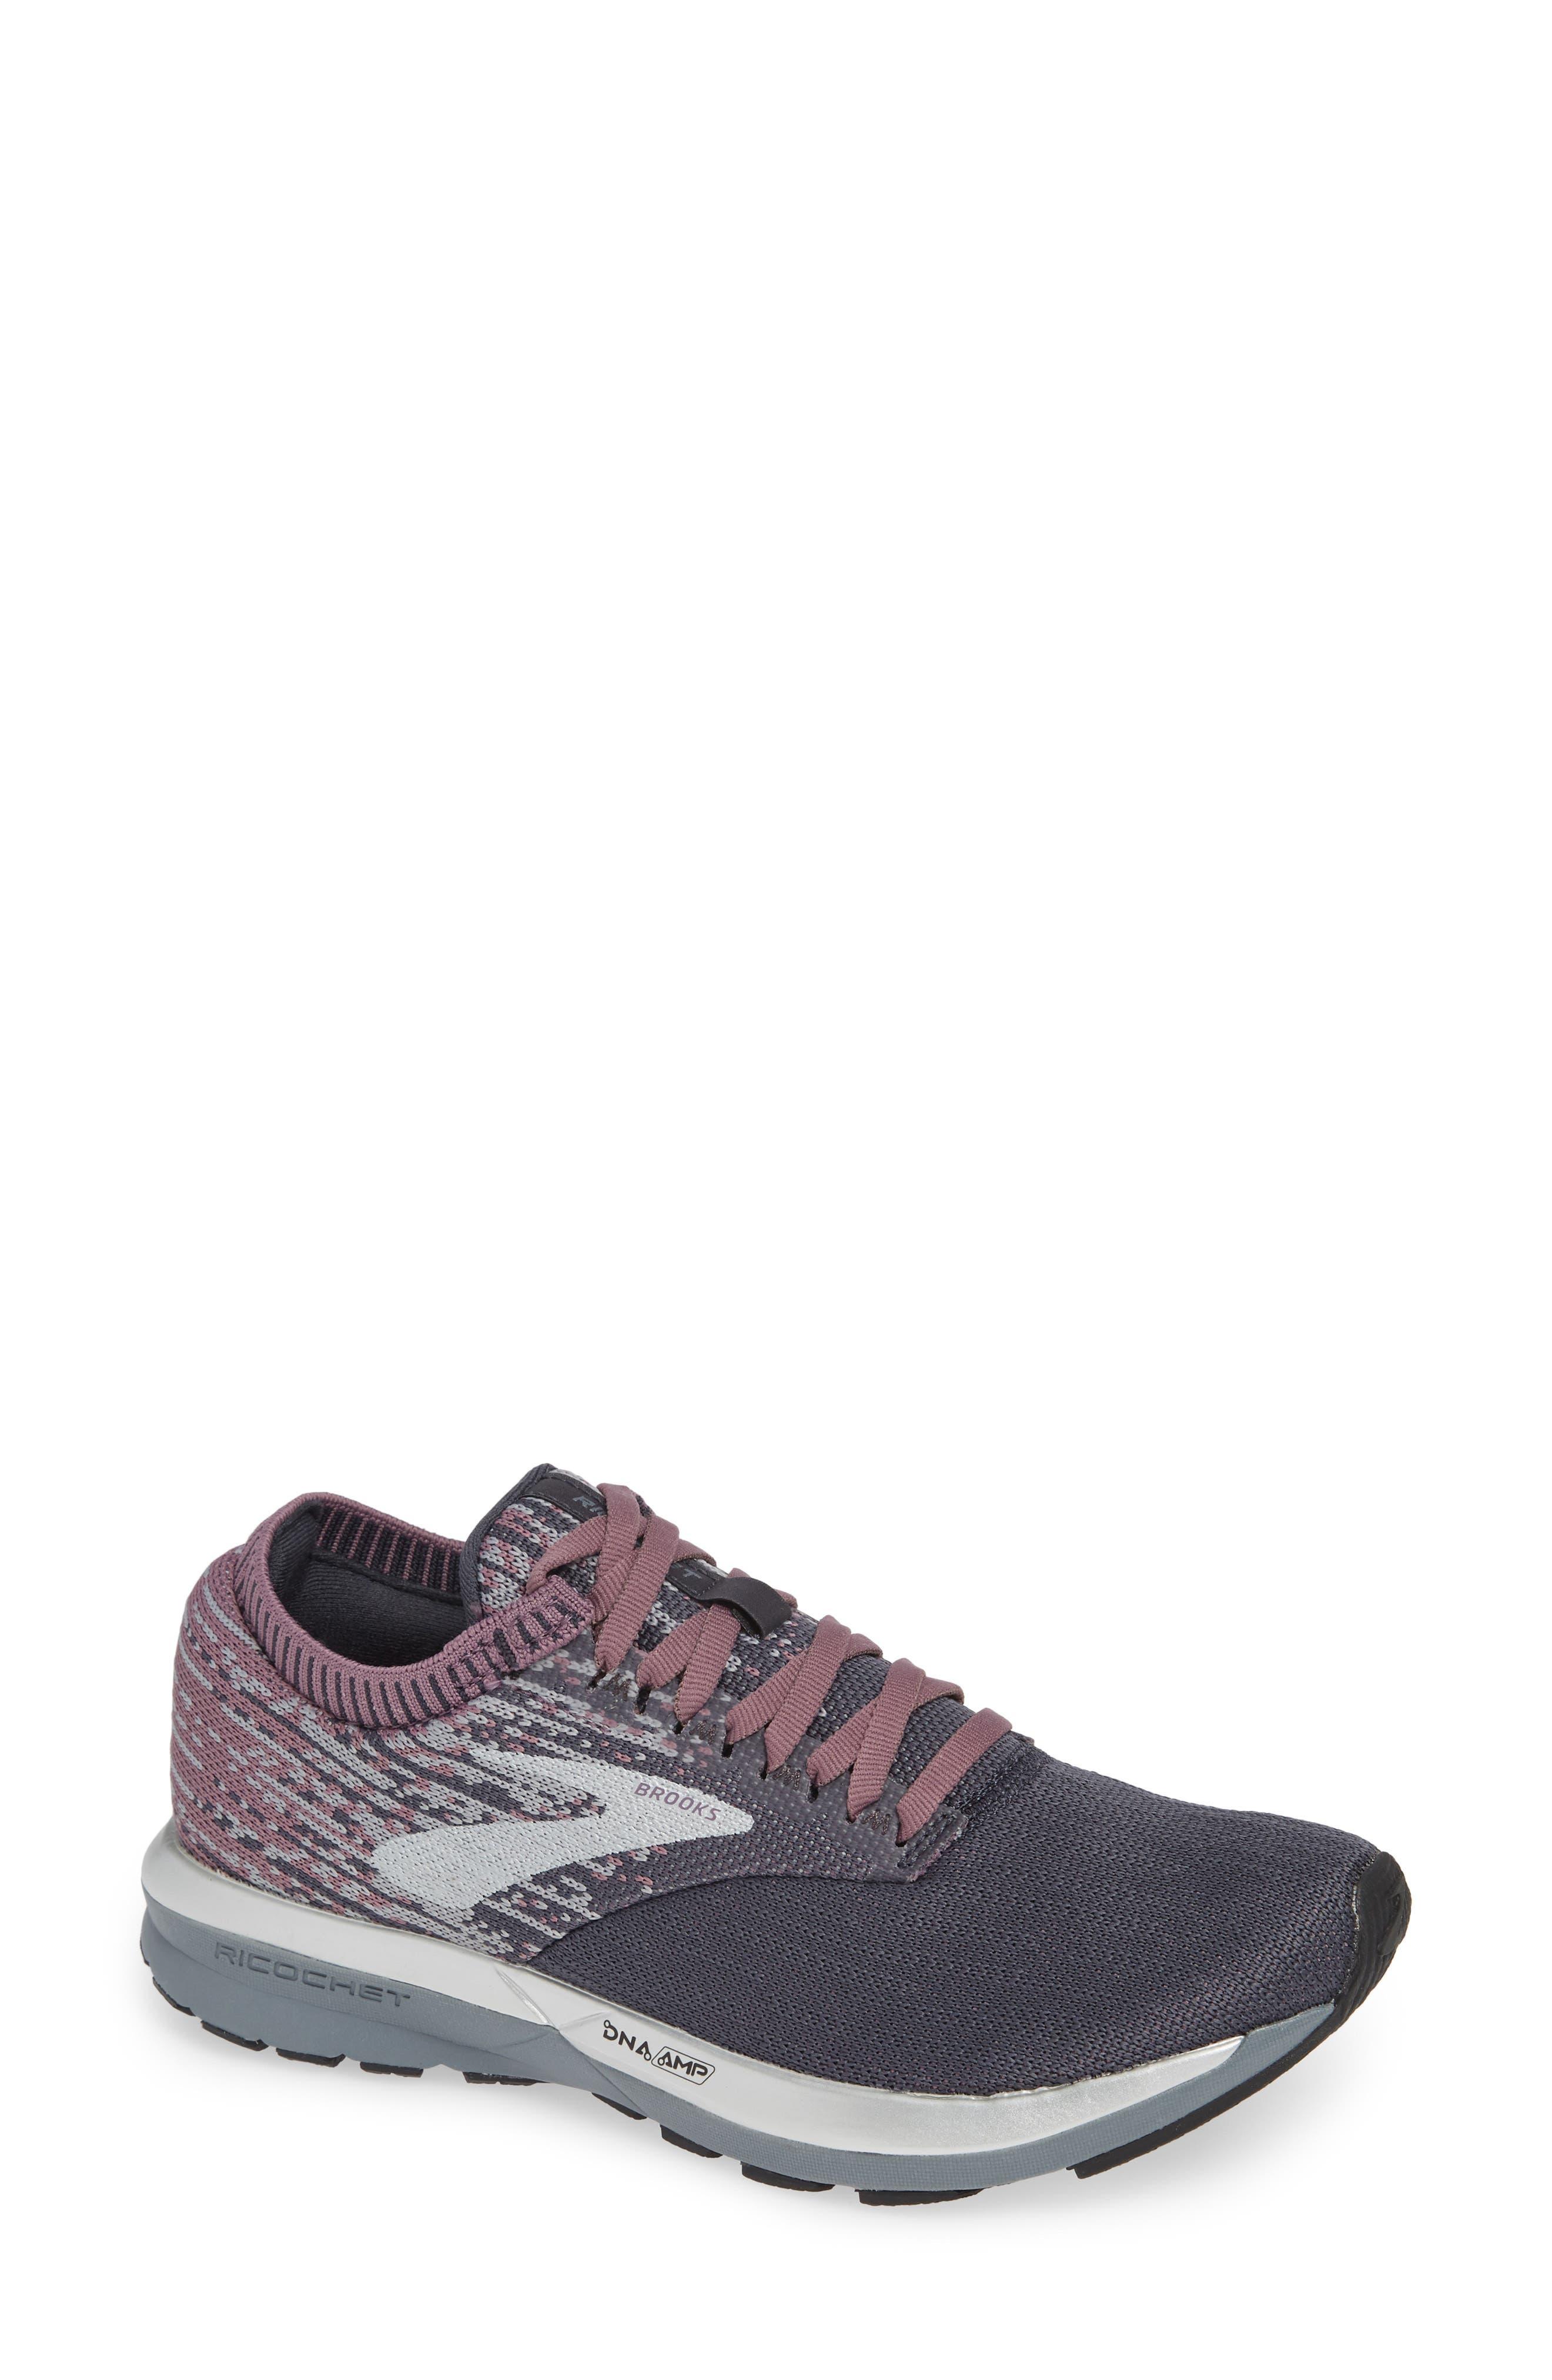 Brooks Ricochet Running Shoe B - Grey